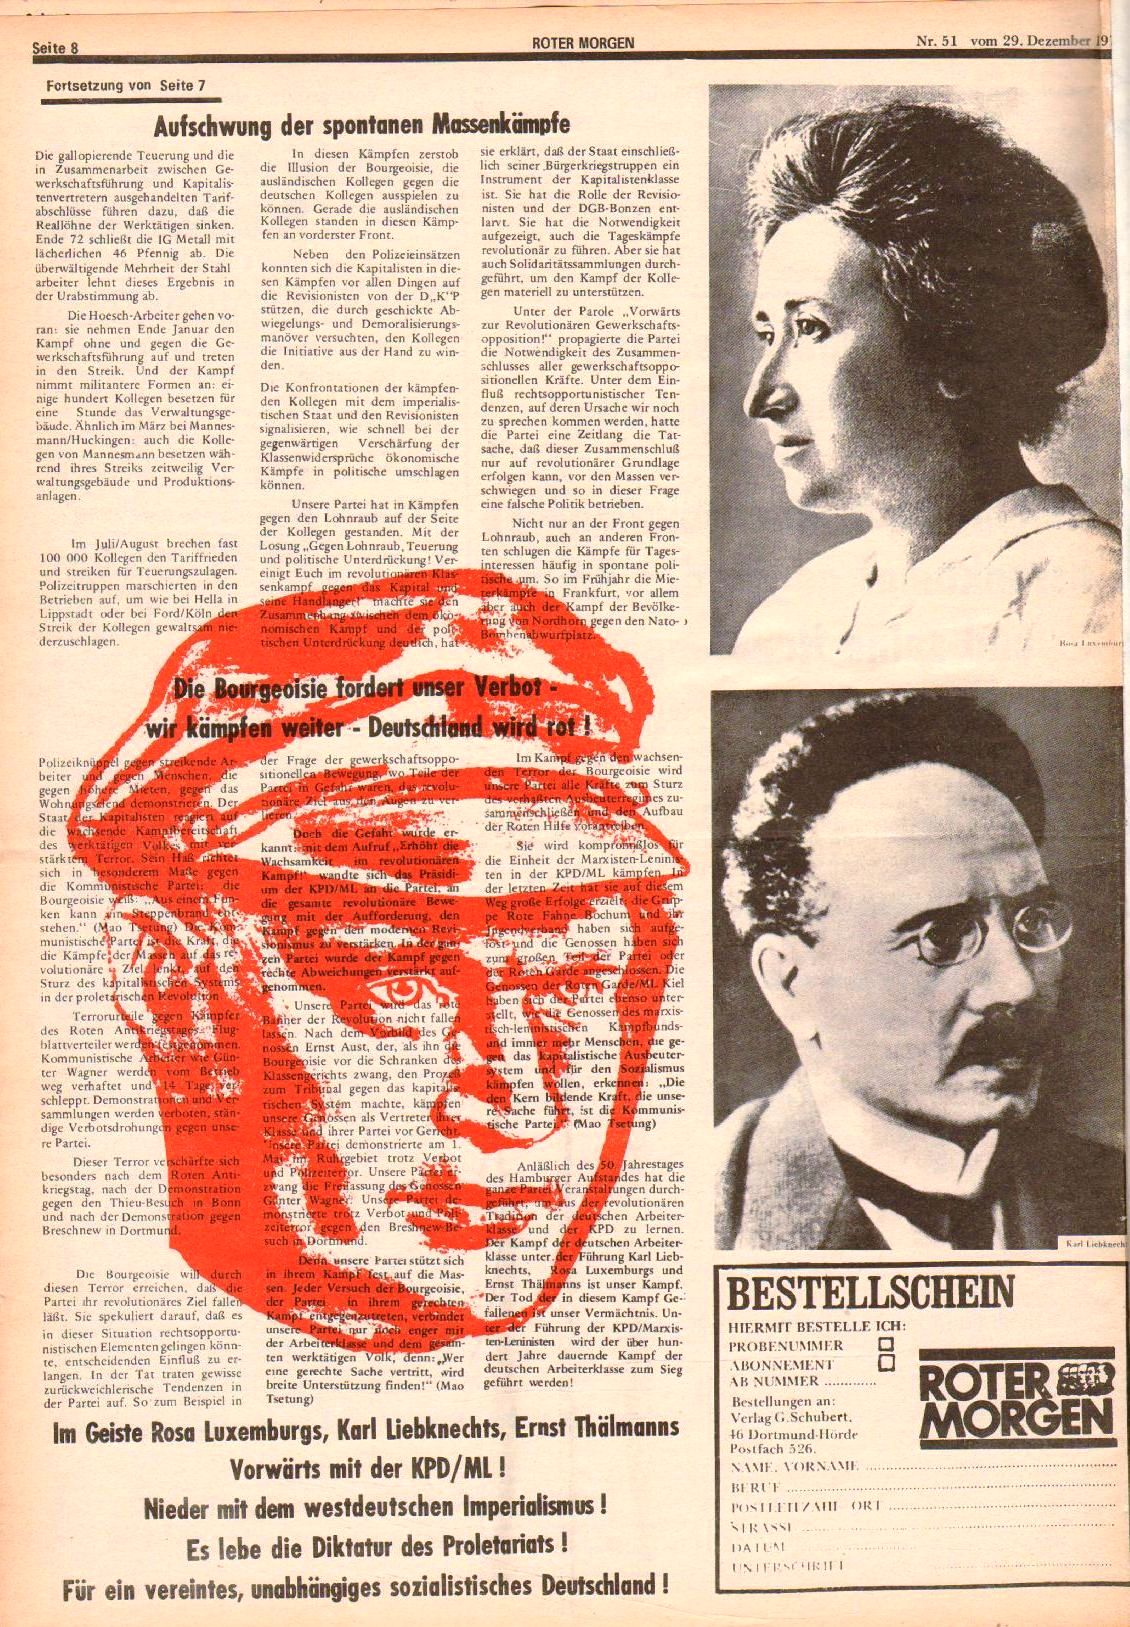 Roter Morgen, 7. Jg., 29. Dezember 1973, Nr. 51, Seite 8